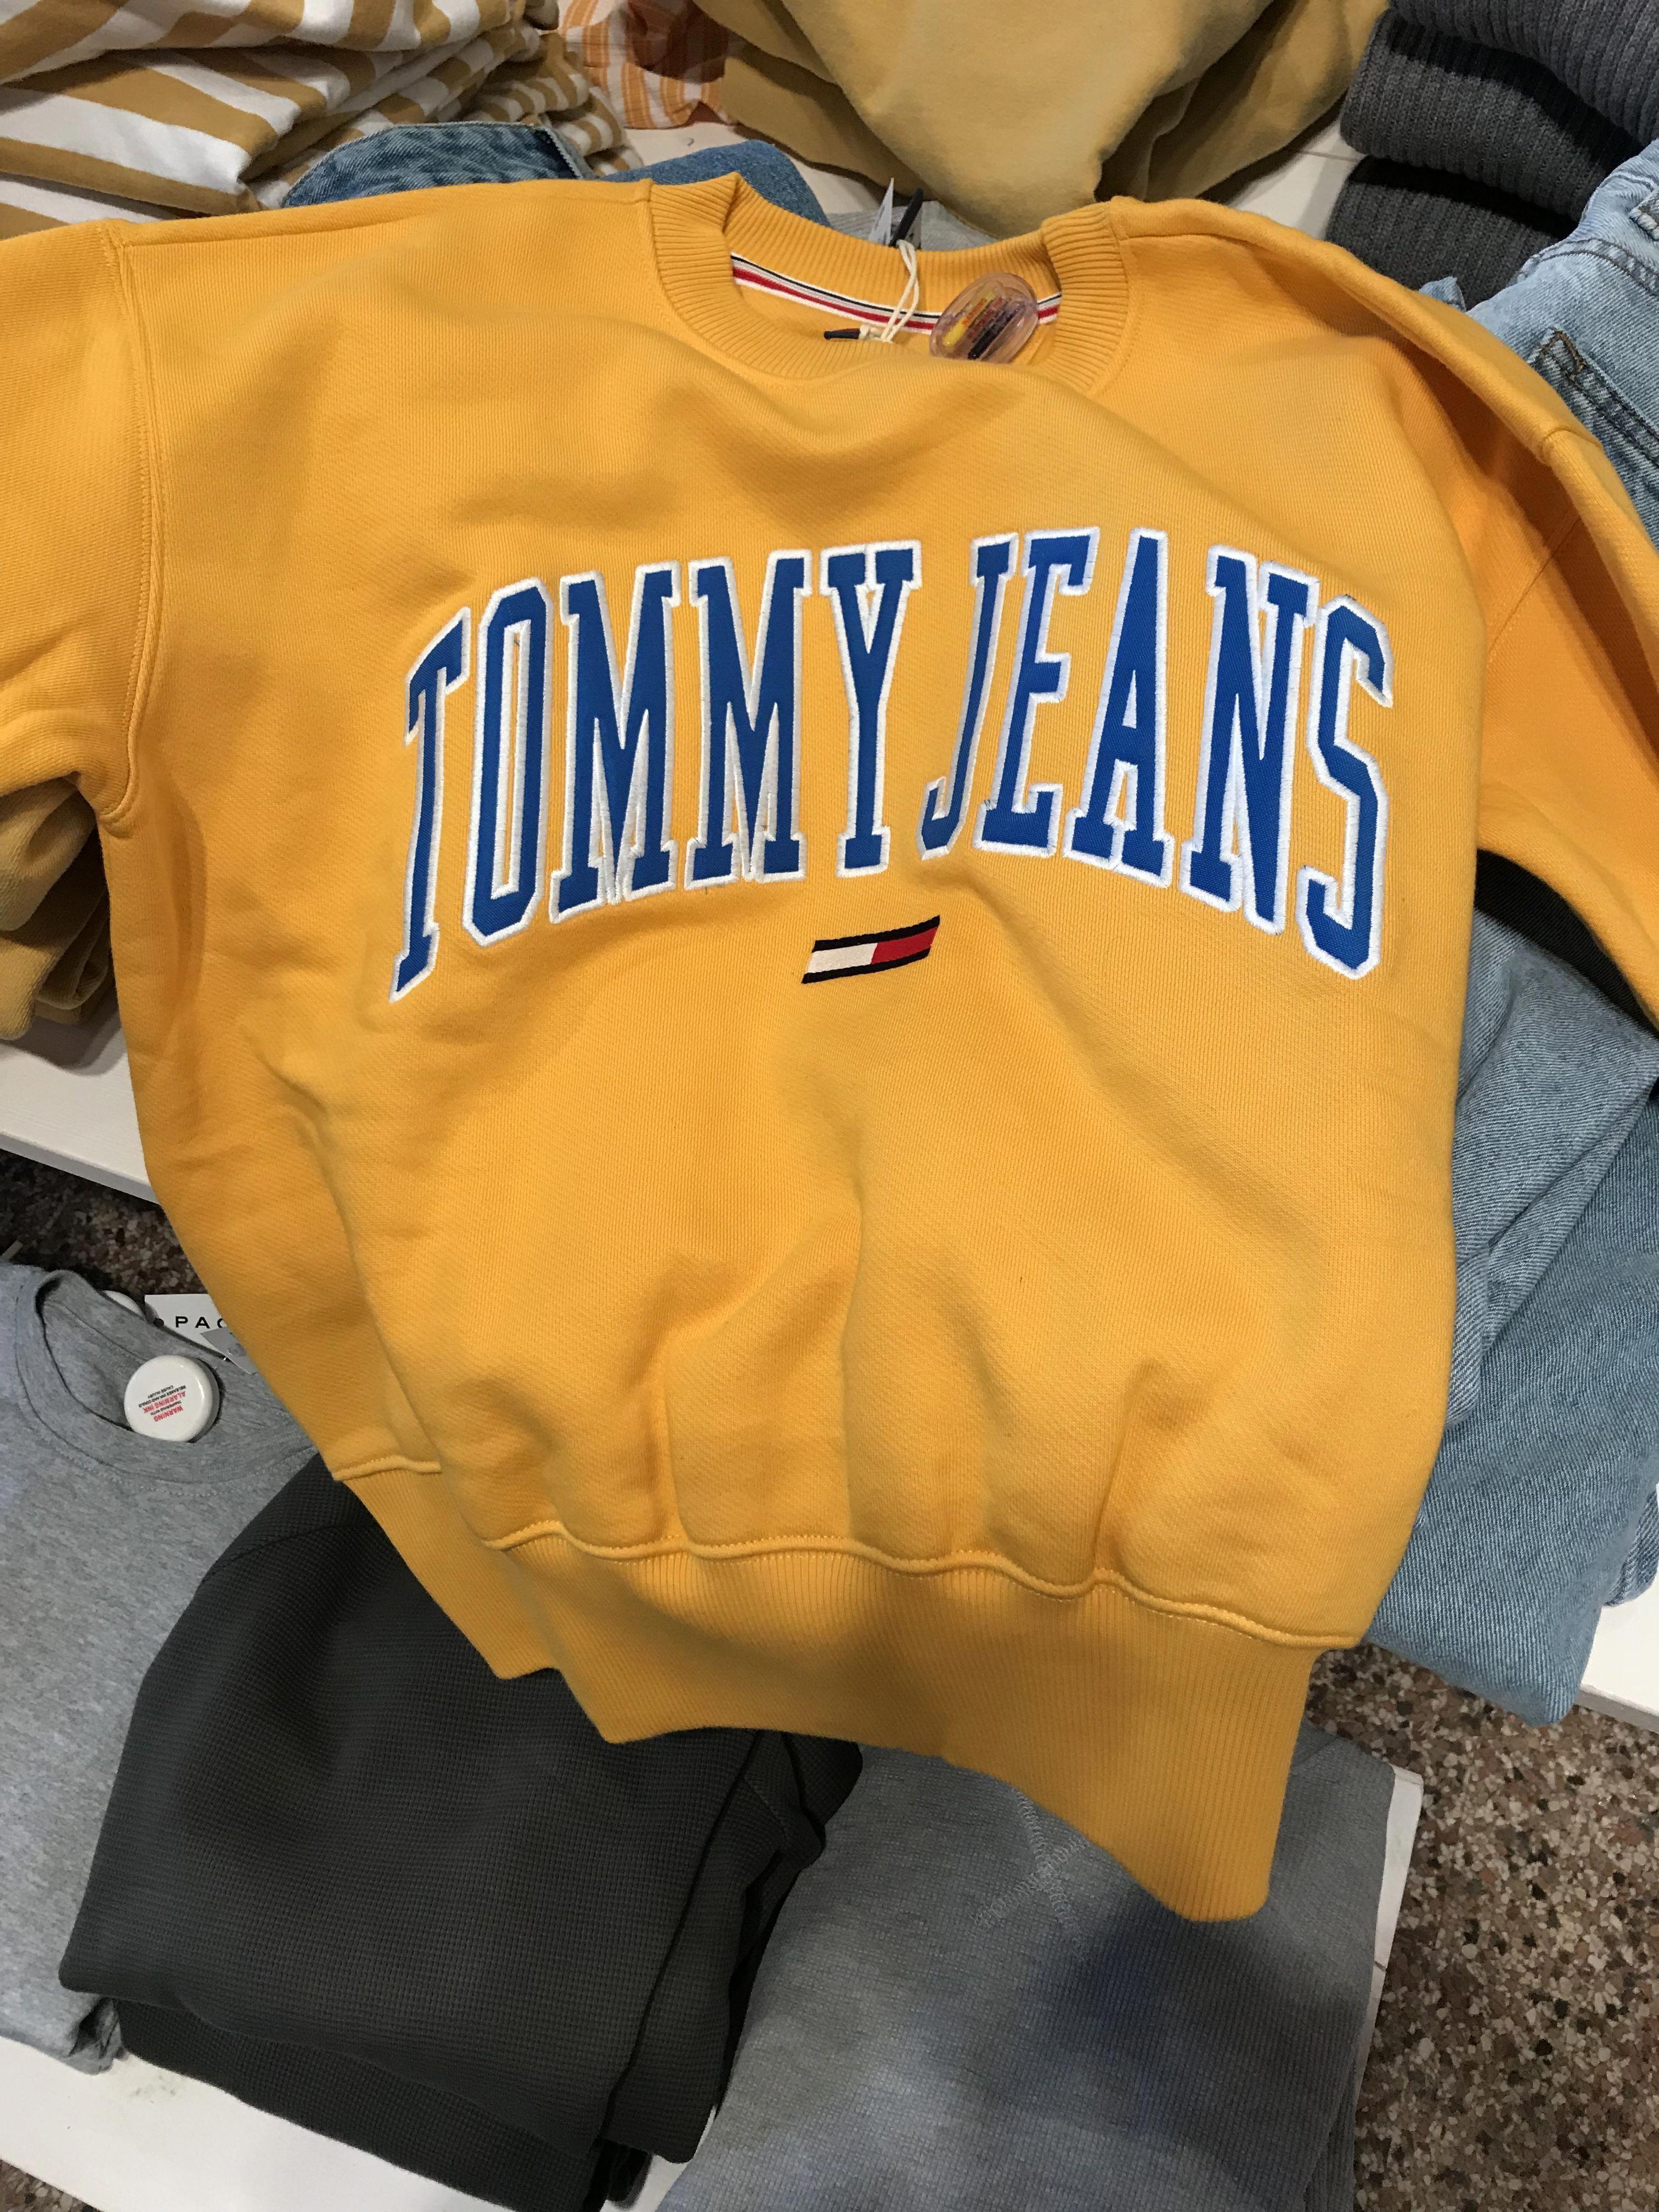 Tommy Hilfiger Yellow Sweatshirt Pacsun Nightoutjeansoutfit Tommy Hilfiger Outfit Trendy Hoodies Trendy Sweatshirt [ 4032 x 3024 Pixel ]